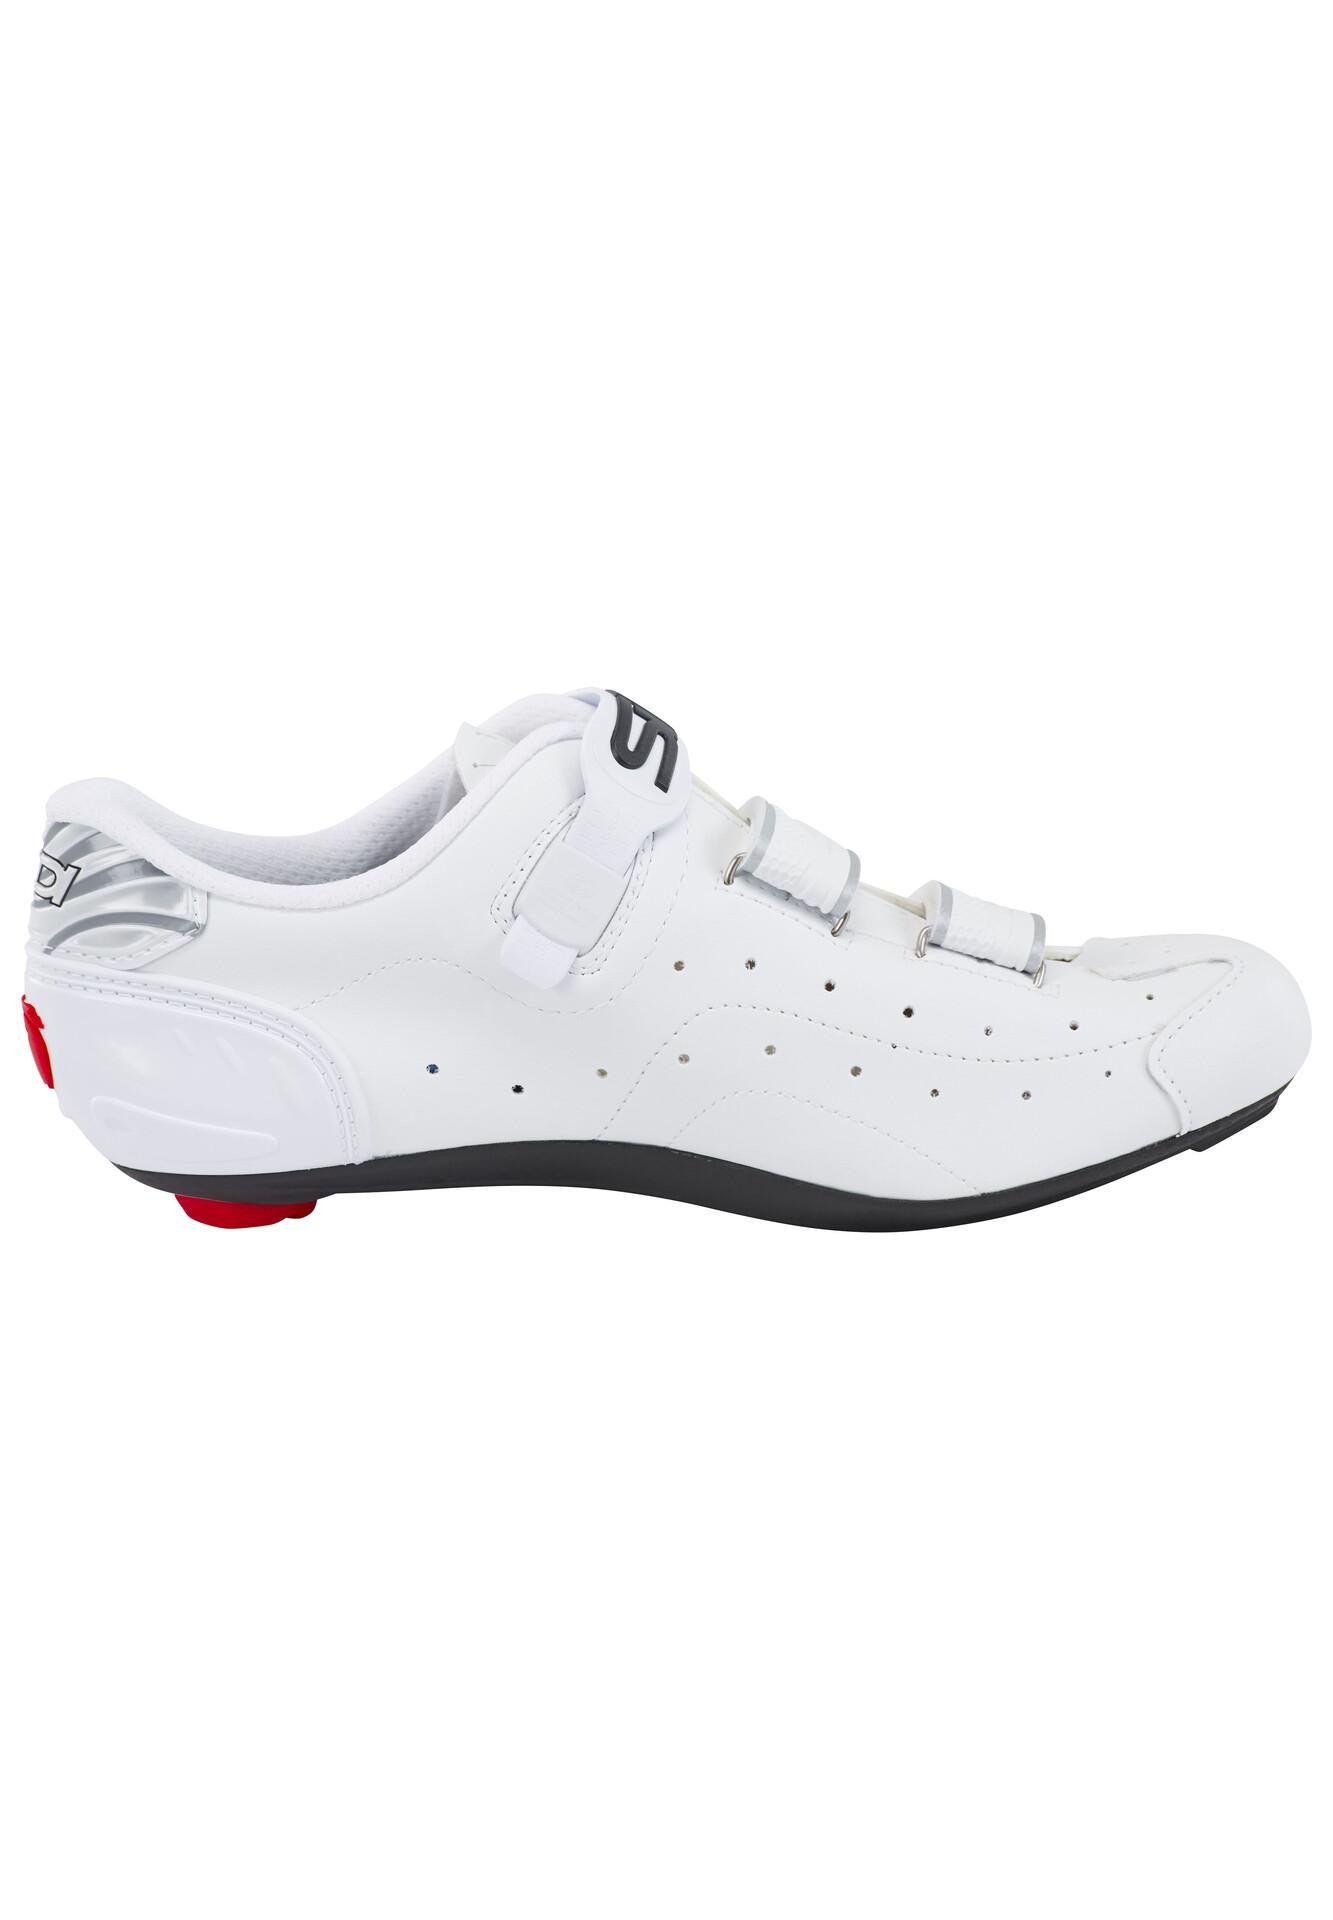 883cff6ffb2 hos bikester Herre no Hvit Level sko tilbud Sidi Gode 0qYSwR-apt ...